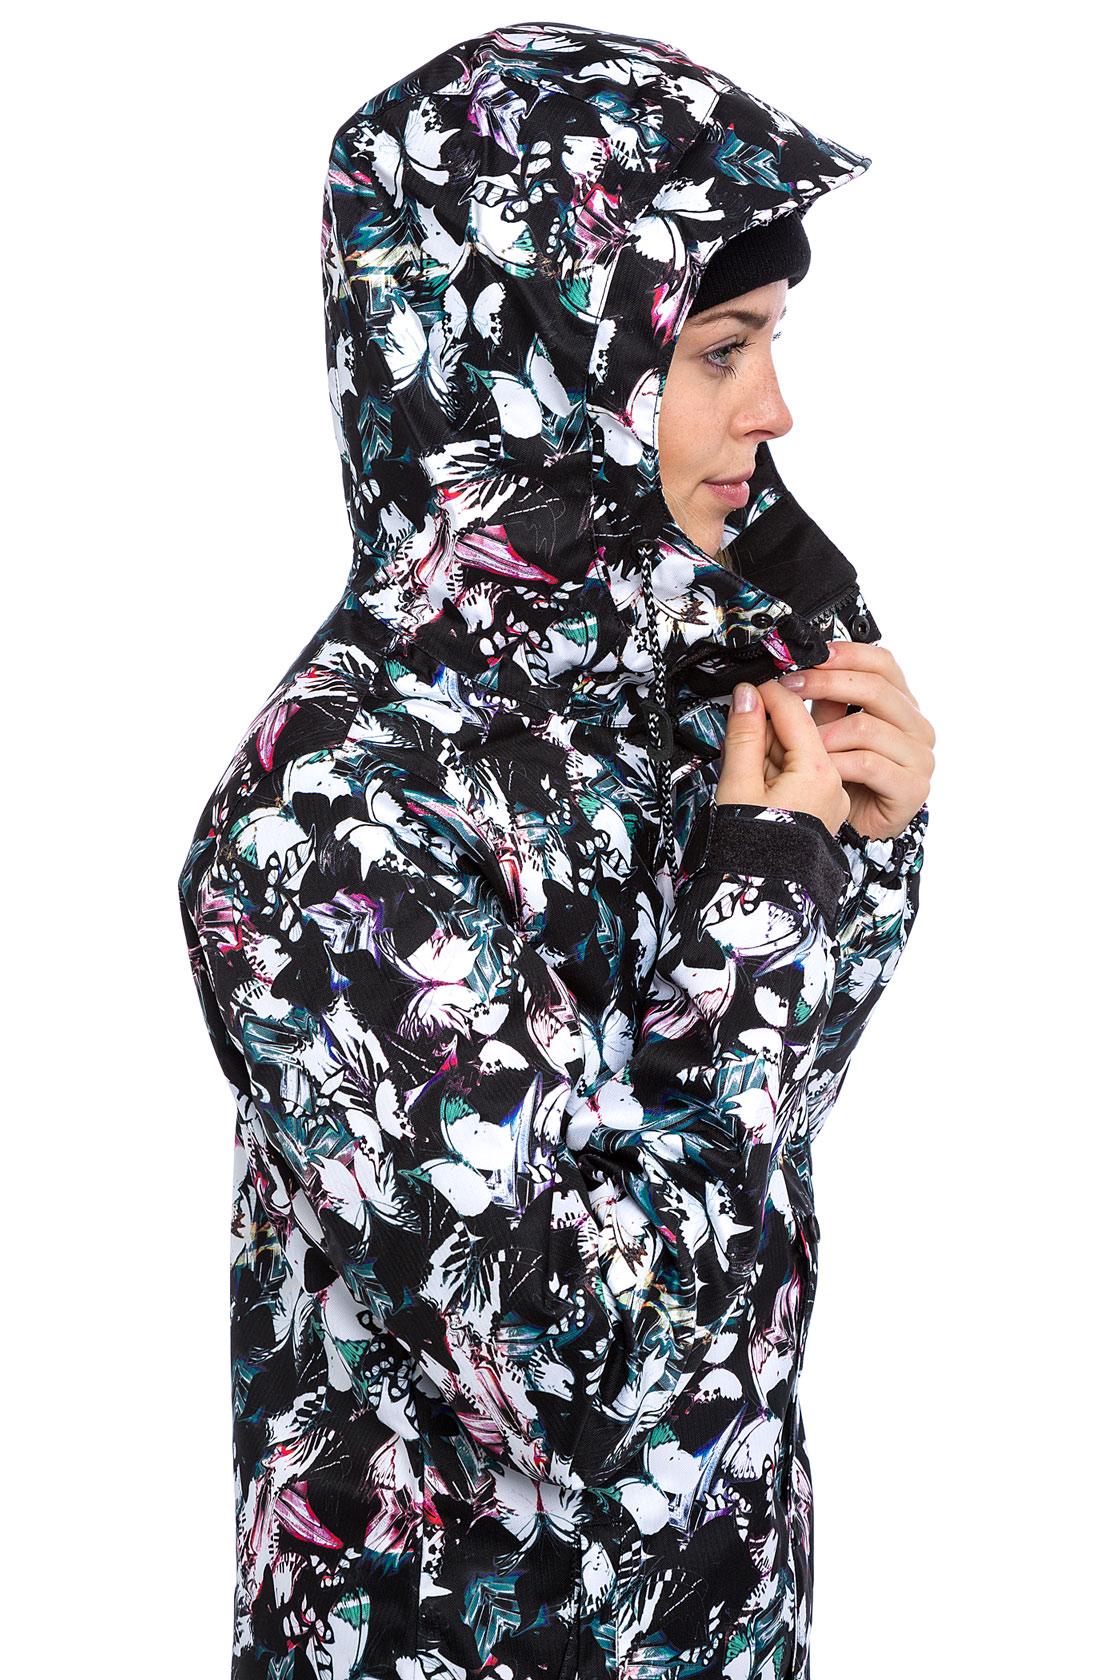 Volcom Bolt Insulated Snowboard Jacket Women Multi Buy At Skatedeluxe